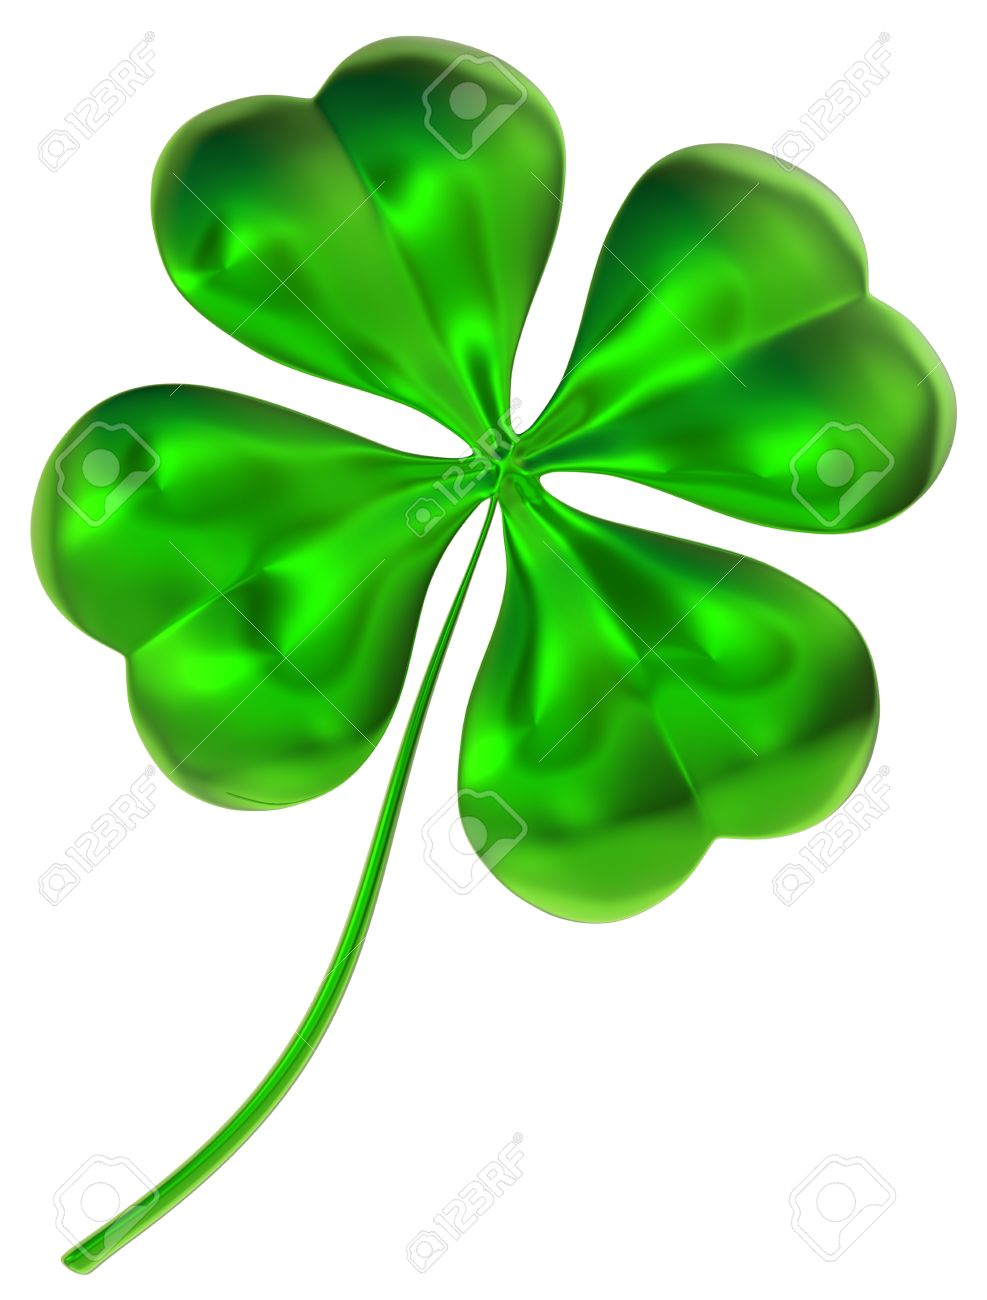 Glossy four leaf clover as international traditional symbol of glossy four leaf clover as international traditional symbol of good luck and fortune zdjcie seryjne biocorpaavc Choice Image